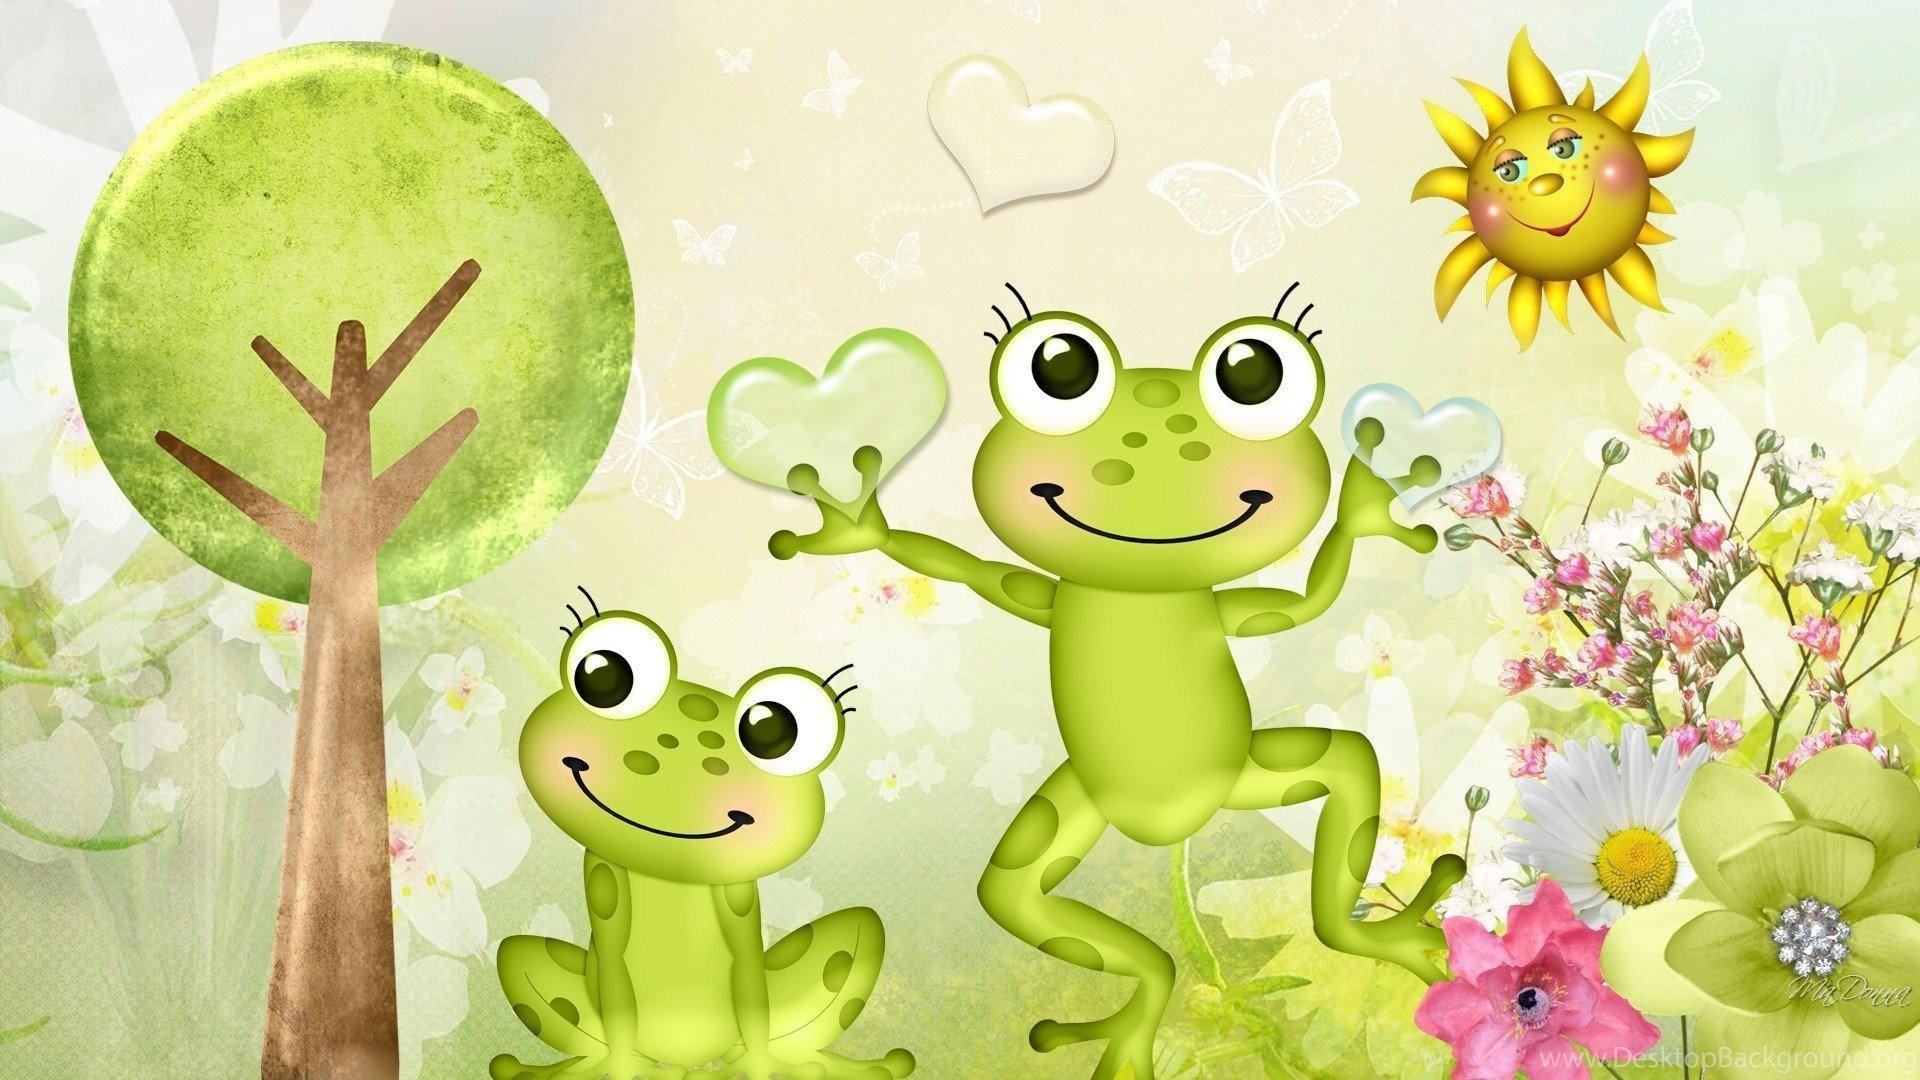 Cartoon Frog 1080p wallpaper